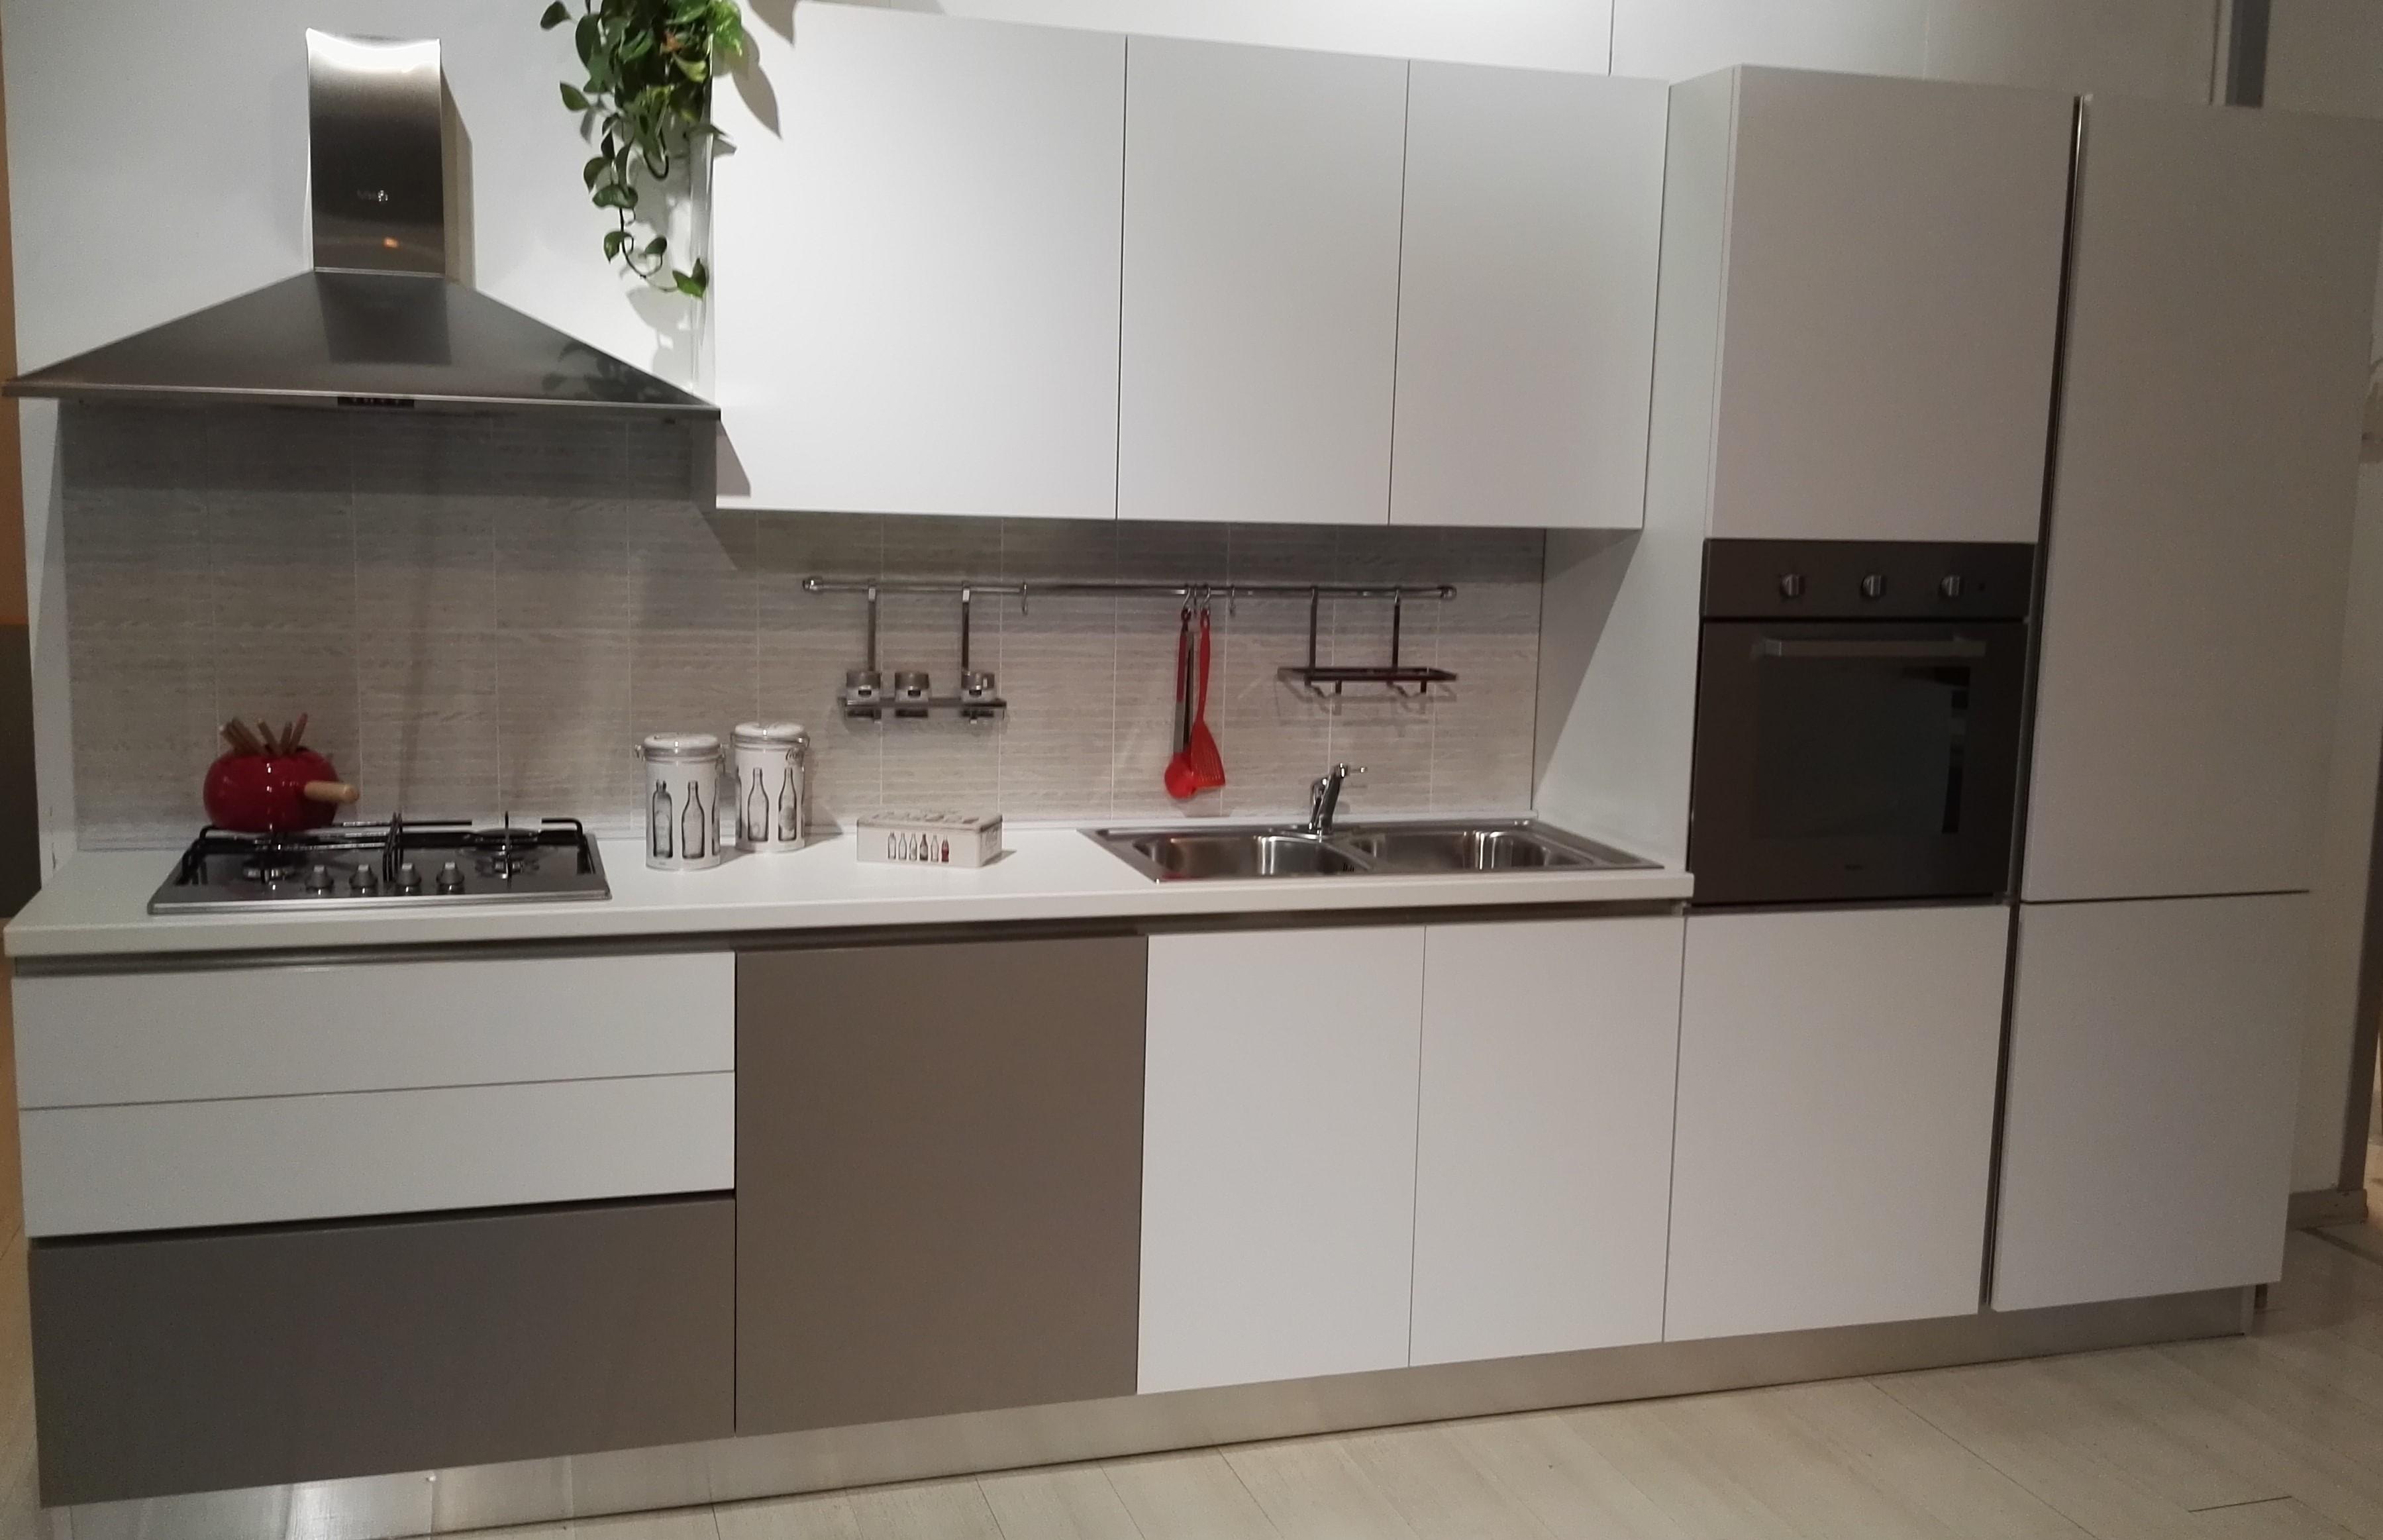 Cucina cm 360, scontatissima pronta consegna   cucine a prezzi ...